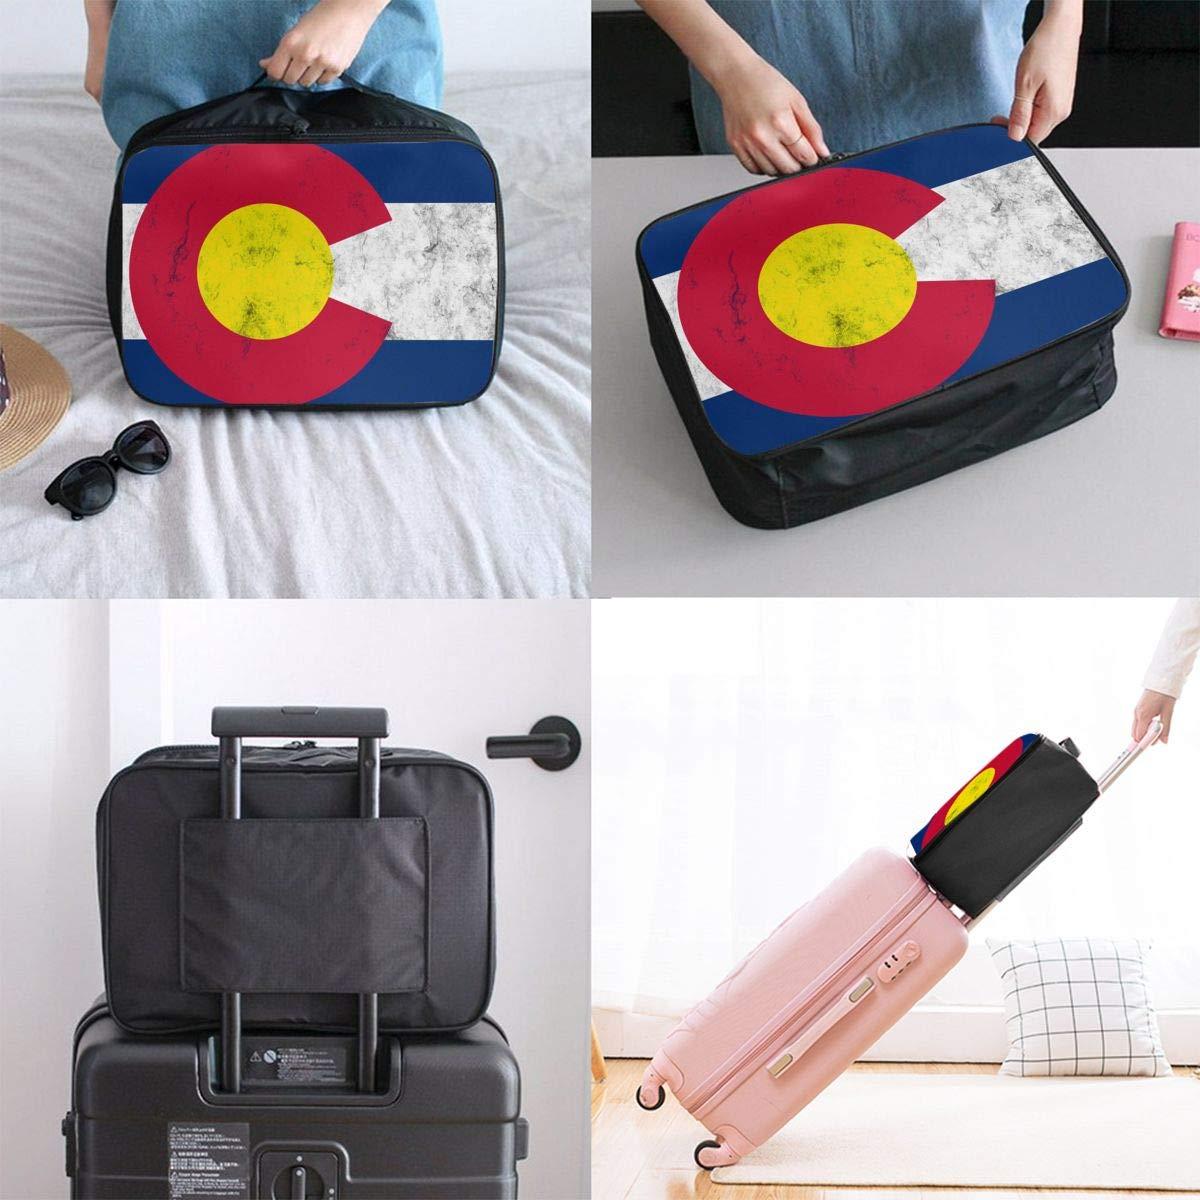 YueLJB Colorado Flag Grunge Lightweight Large Capacity Portable Luggage Bag Travel Duffel Bag Storage Carry Luggage Duffle Tote Bag